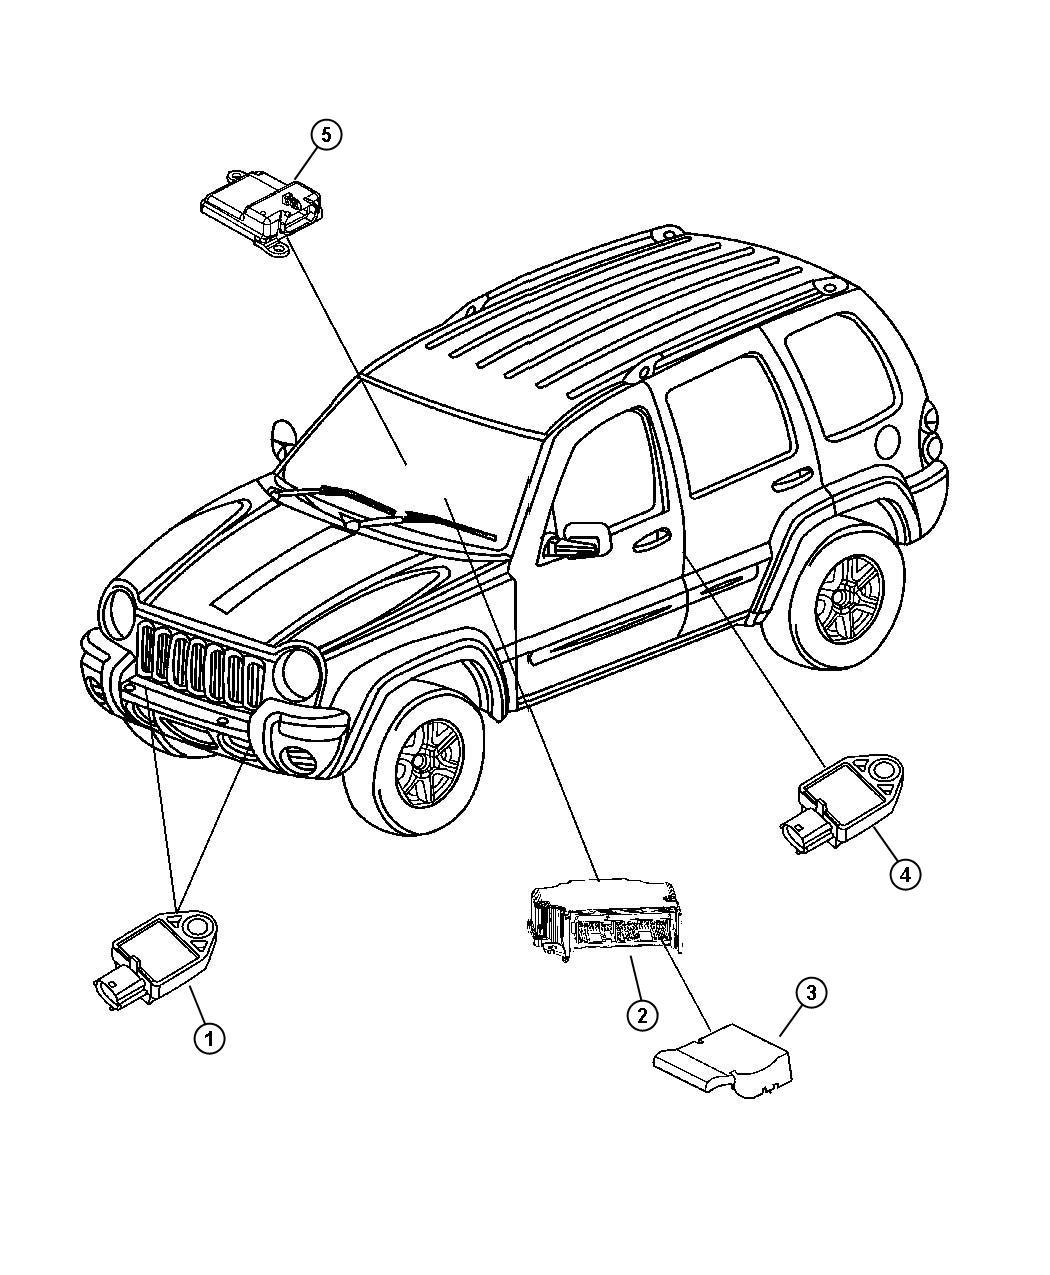 2005 Jeep Liberty Air Bag Module And Sensors